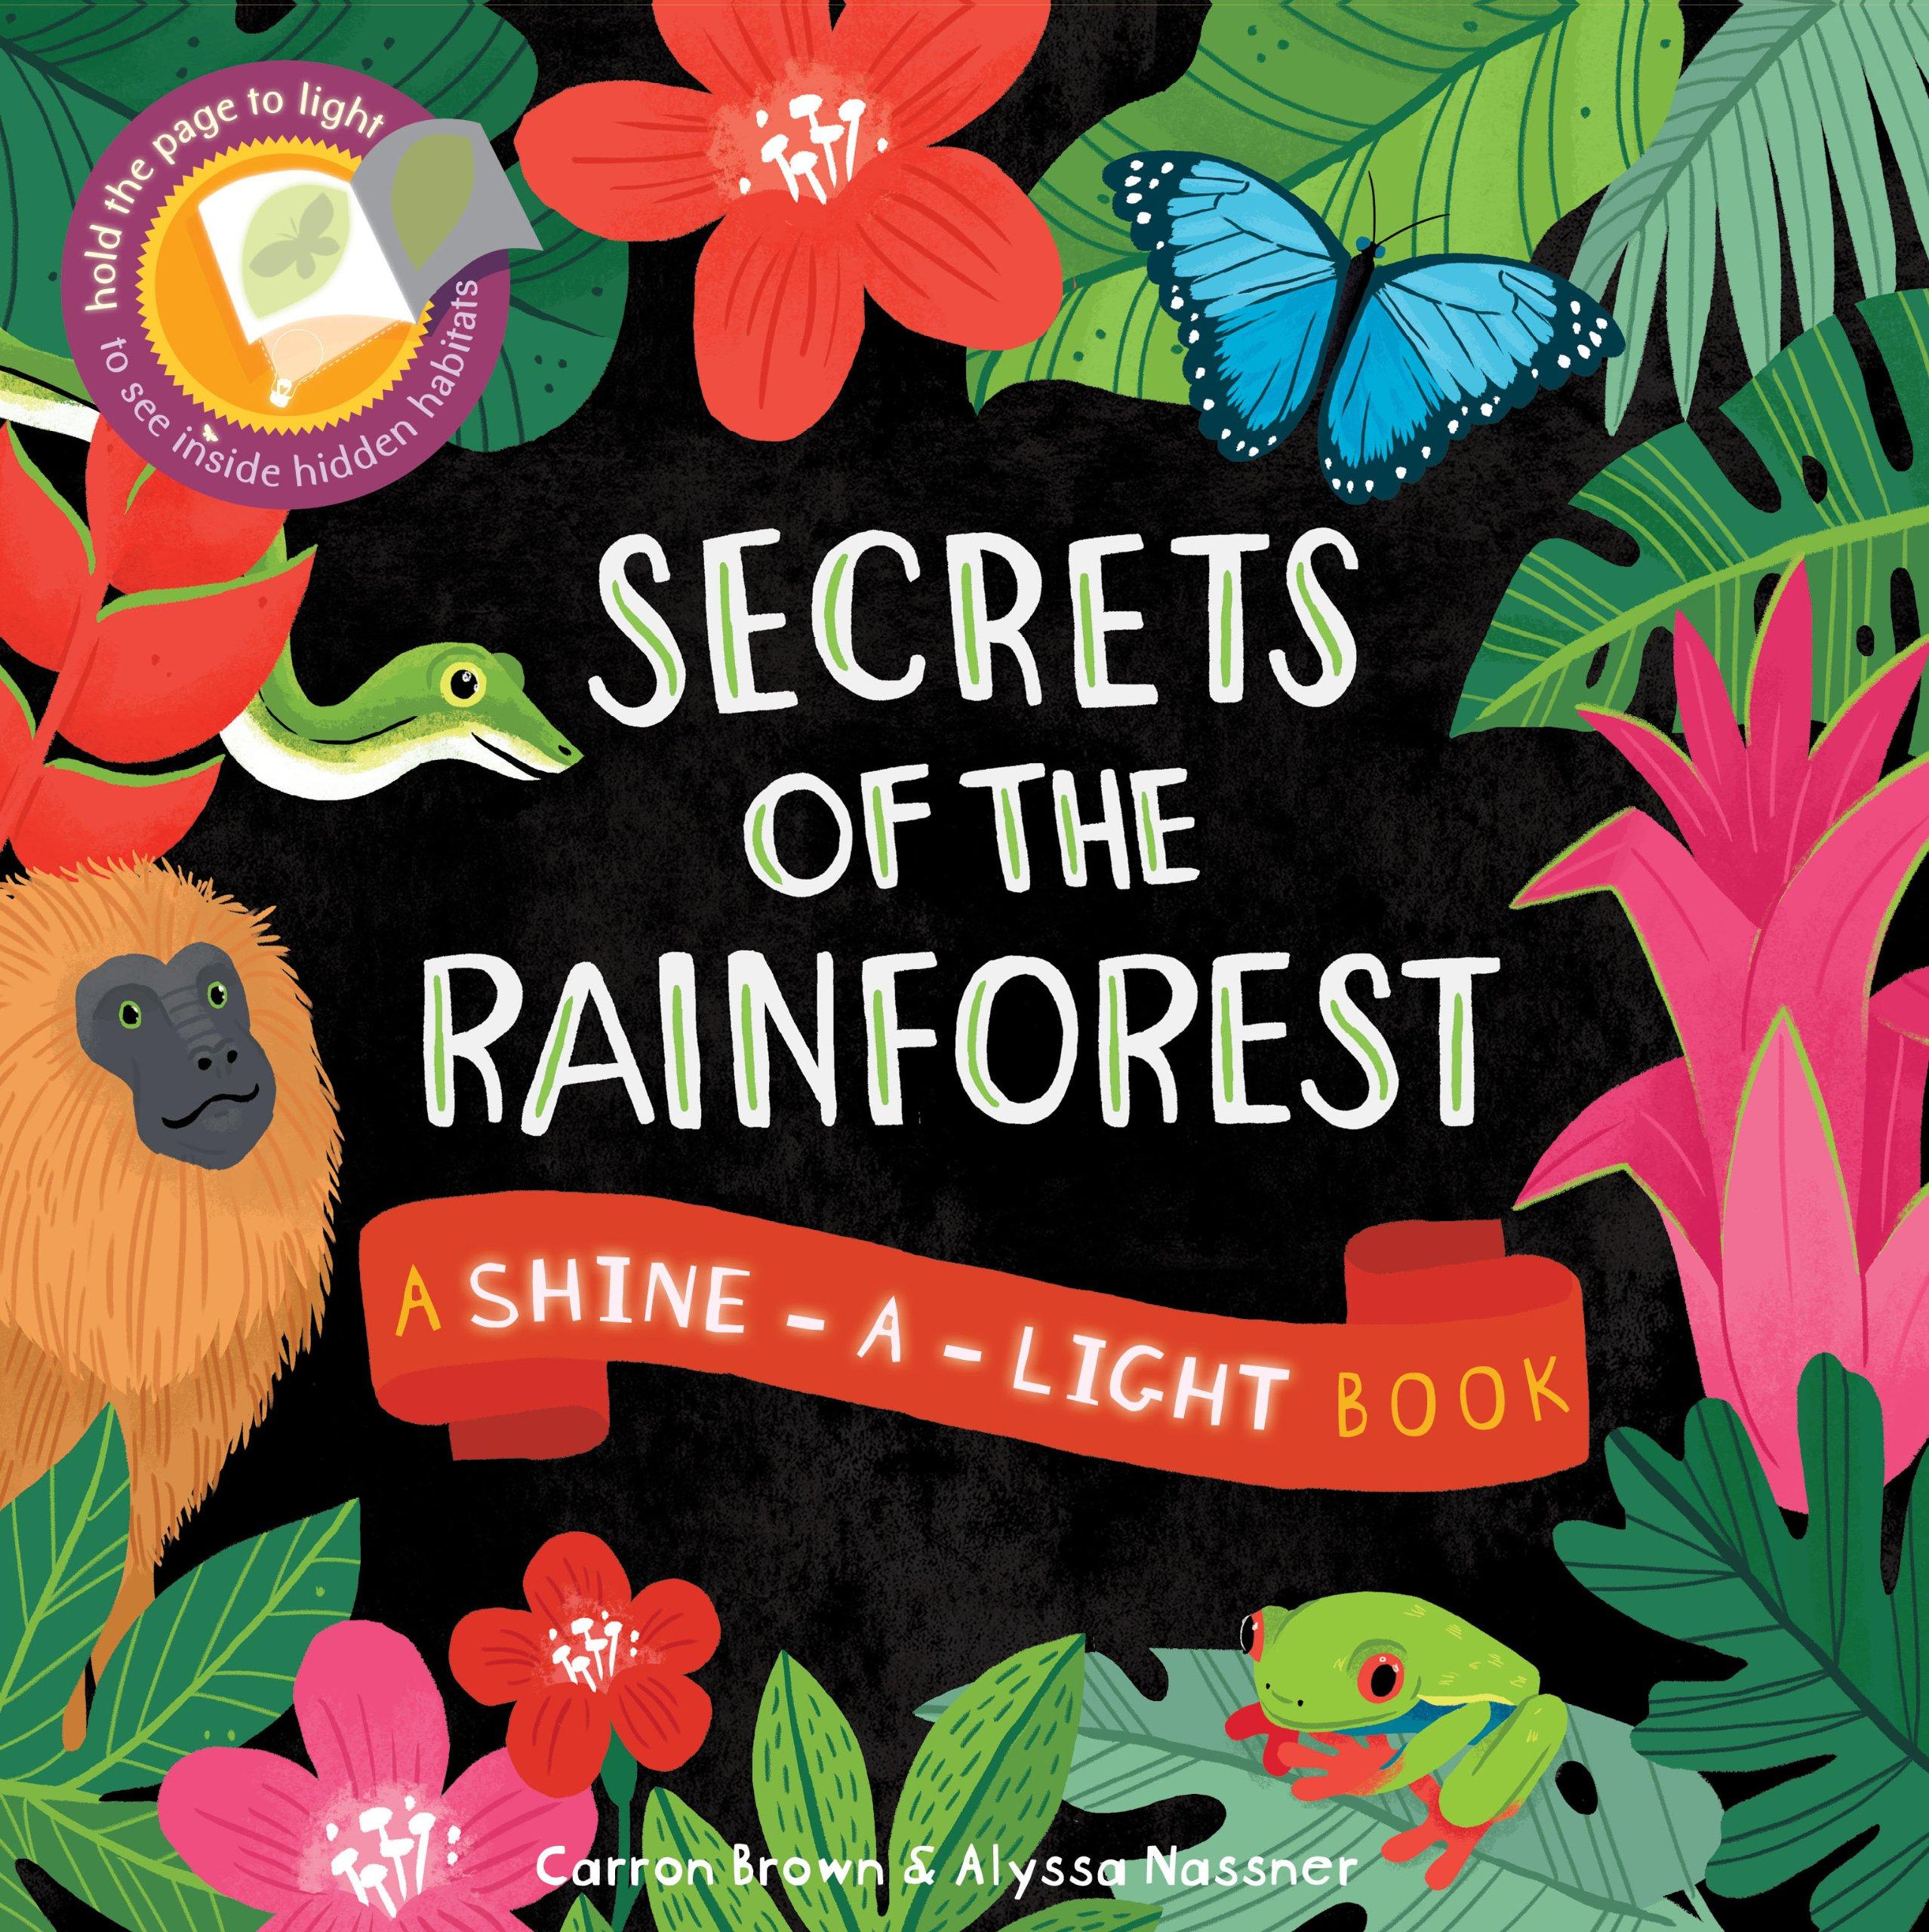 Secrets of the rainforest a shine a light book shine a light books secrets of the rainforest a shine a light book shine a light books carron brown 9781782401490 amazon books izmirmasajfo